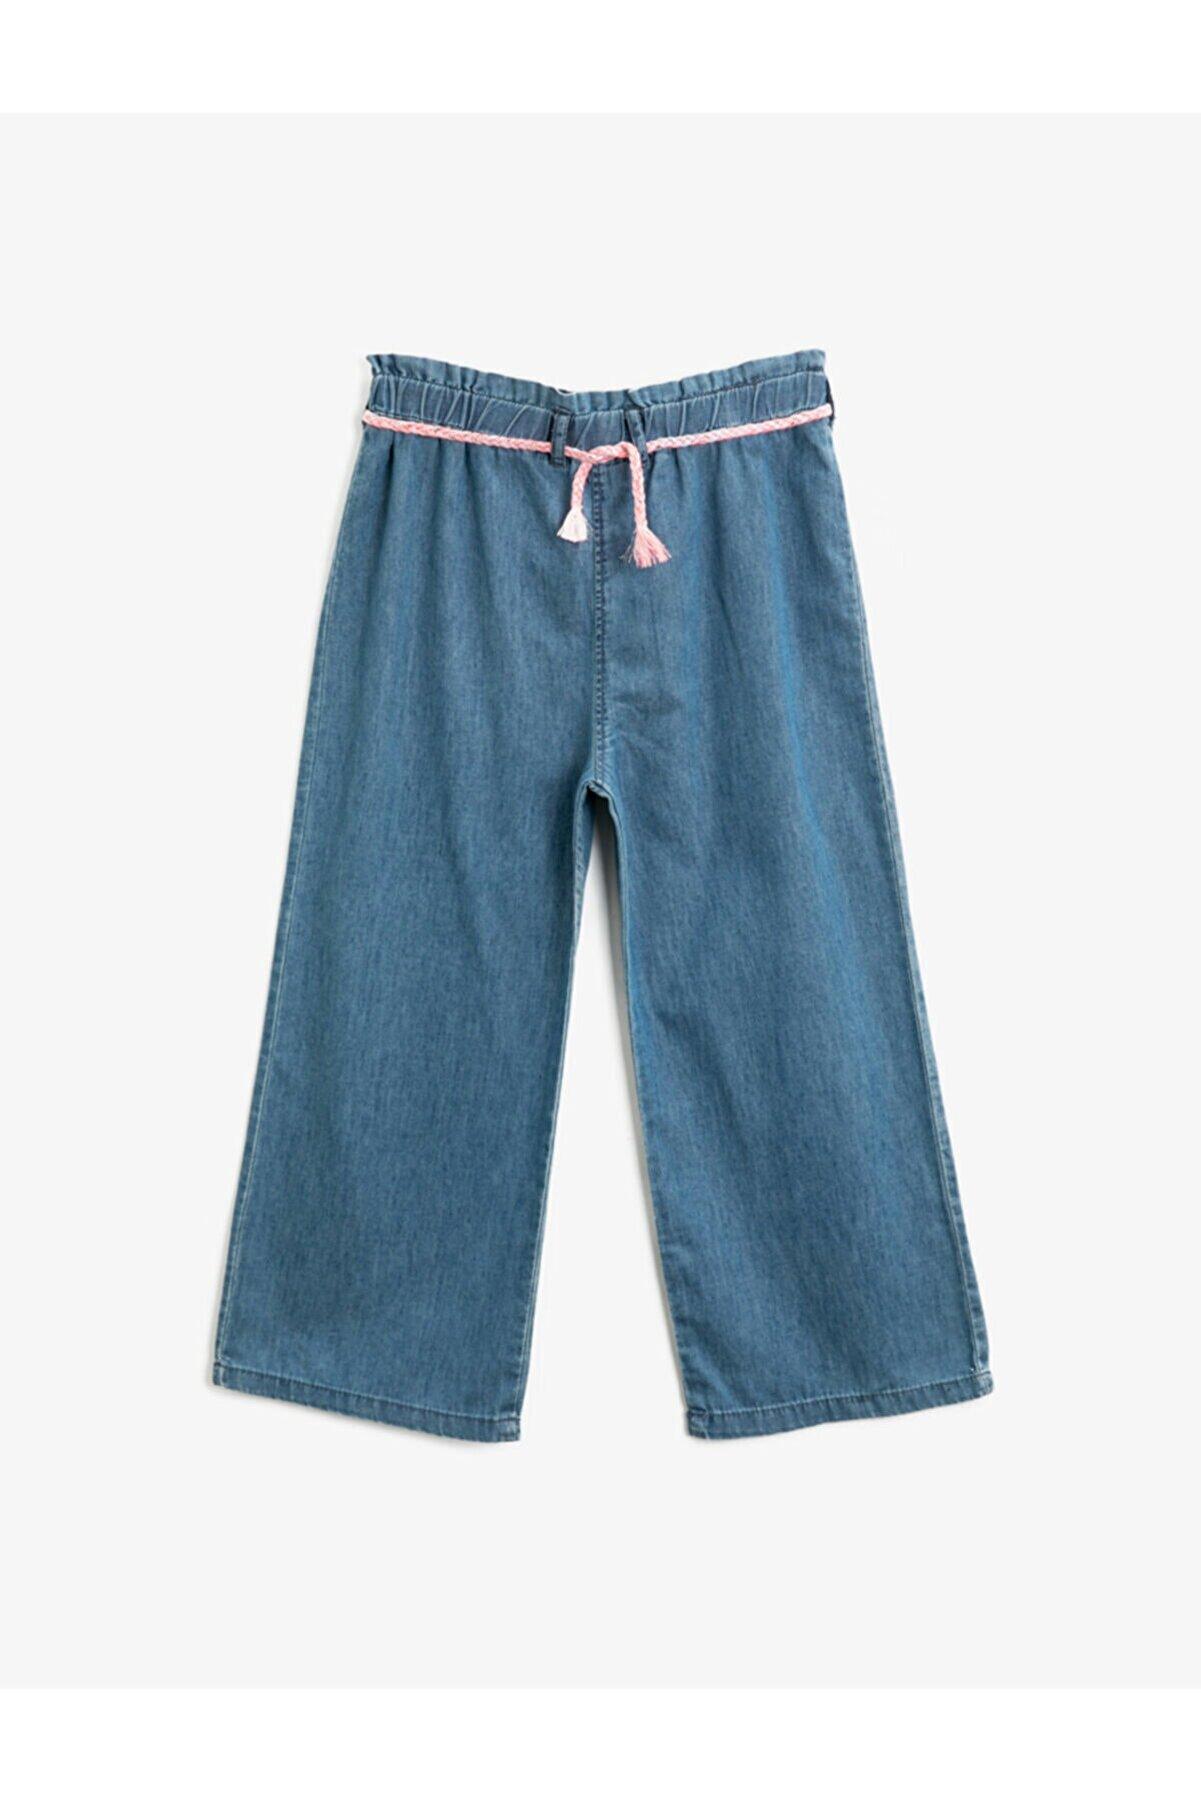 Koton Kız Çocuk Lacivert Orta Jeans 1YKG47519OD